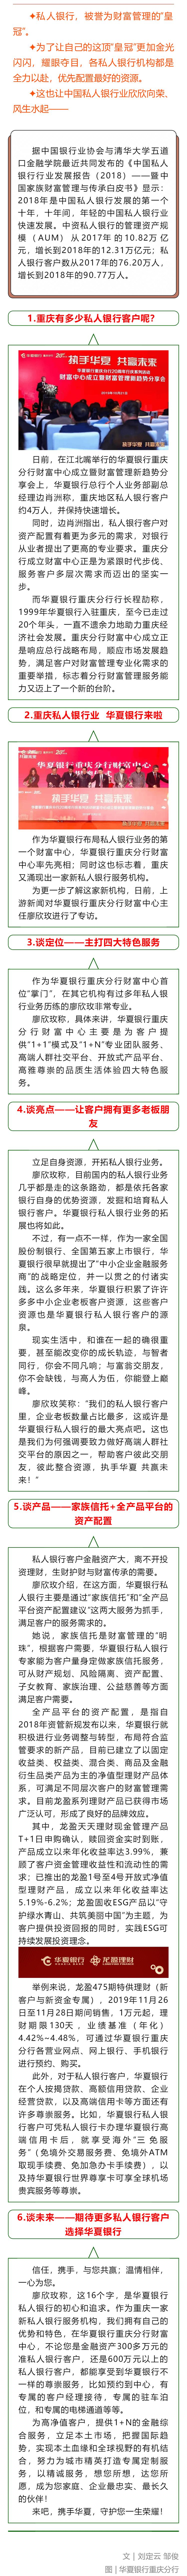 20191125_1903_yiban_screenshot.png